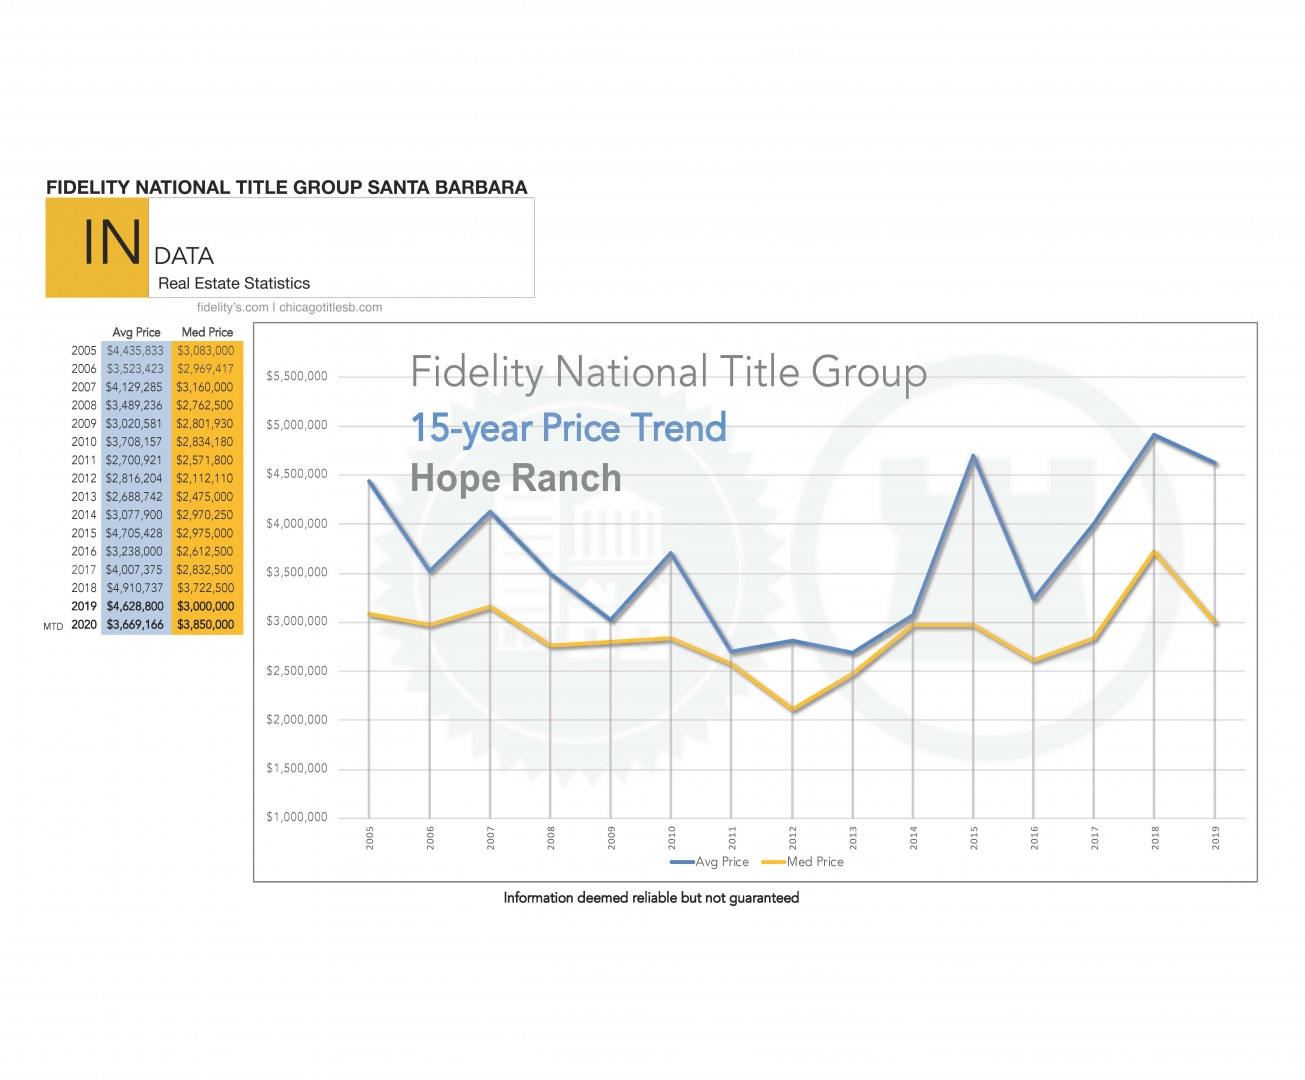 The Santa Barbara Real Estate Market Reports for April 2020